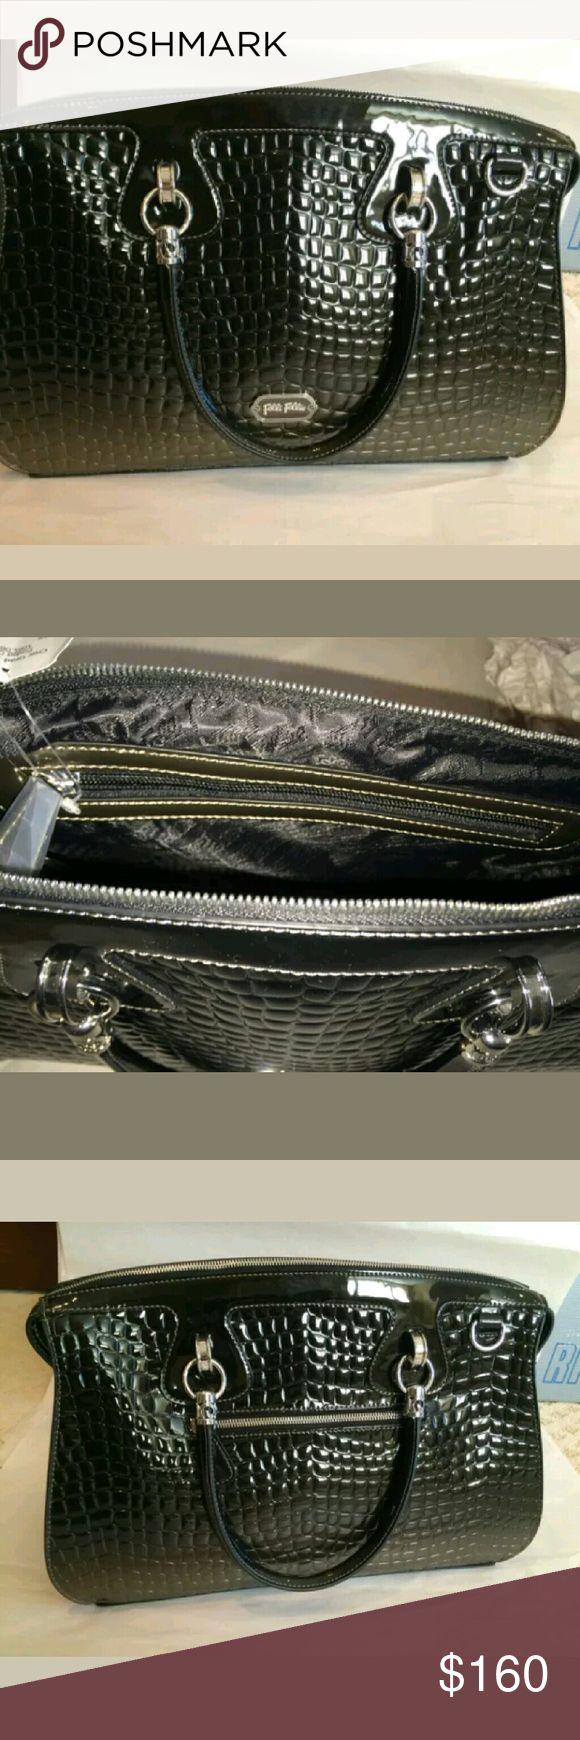 Folli Follie handbag Folli Follie handbag used black n gray Folli Follie Bags